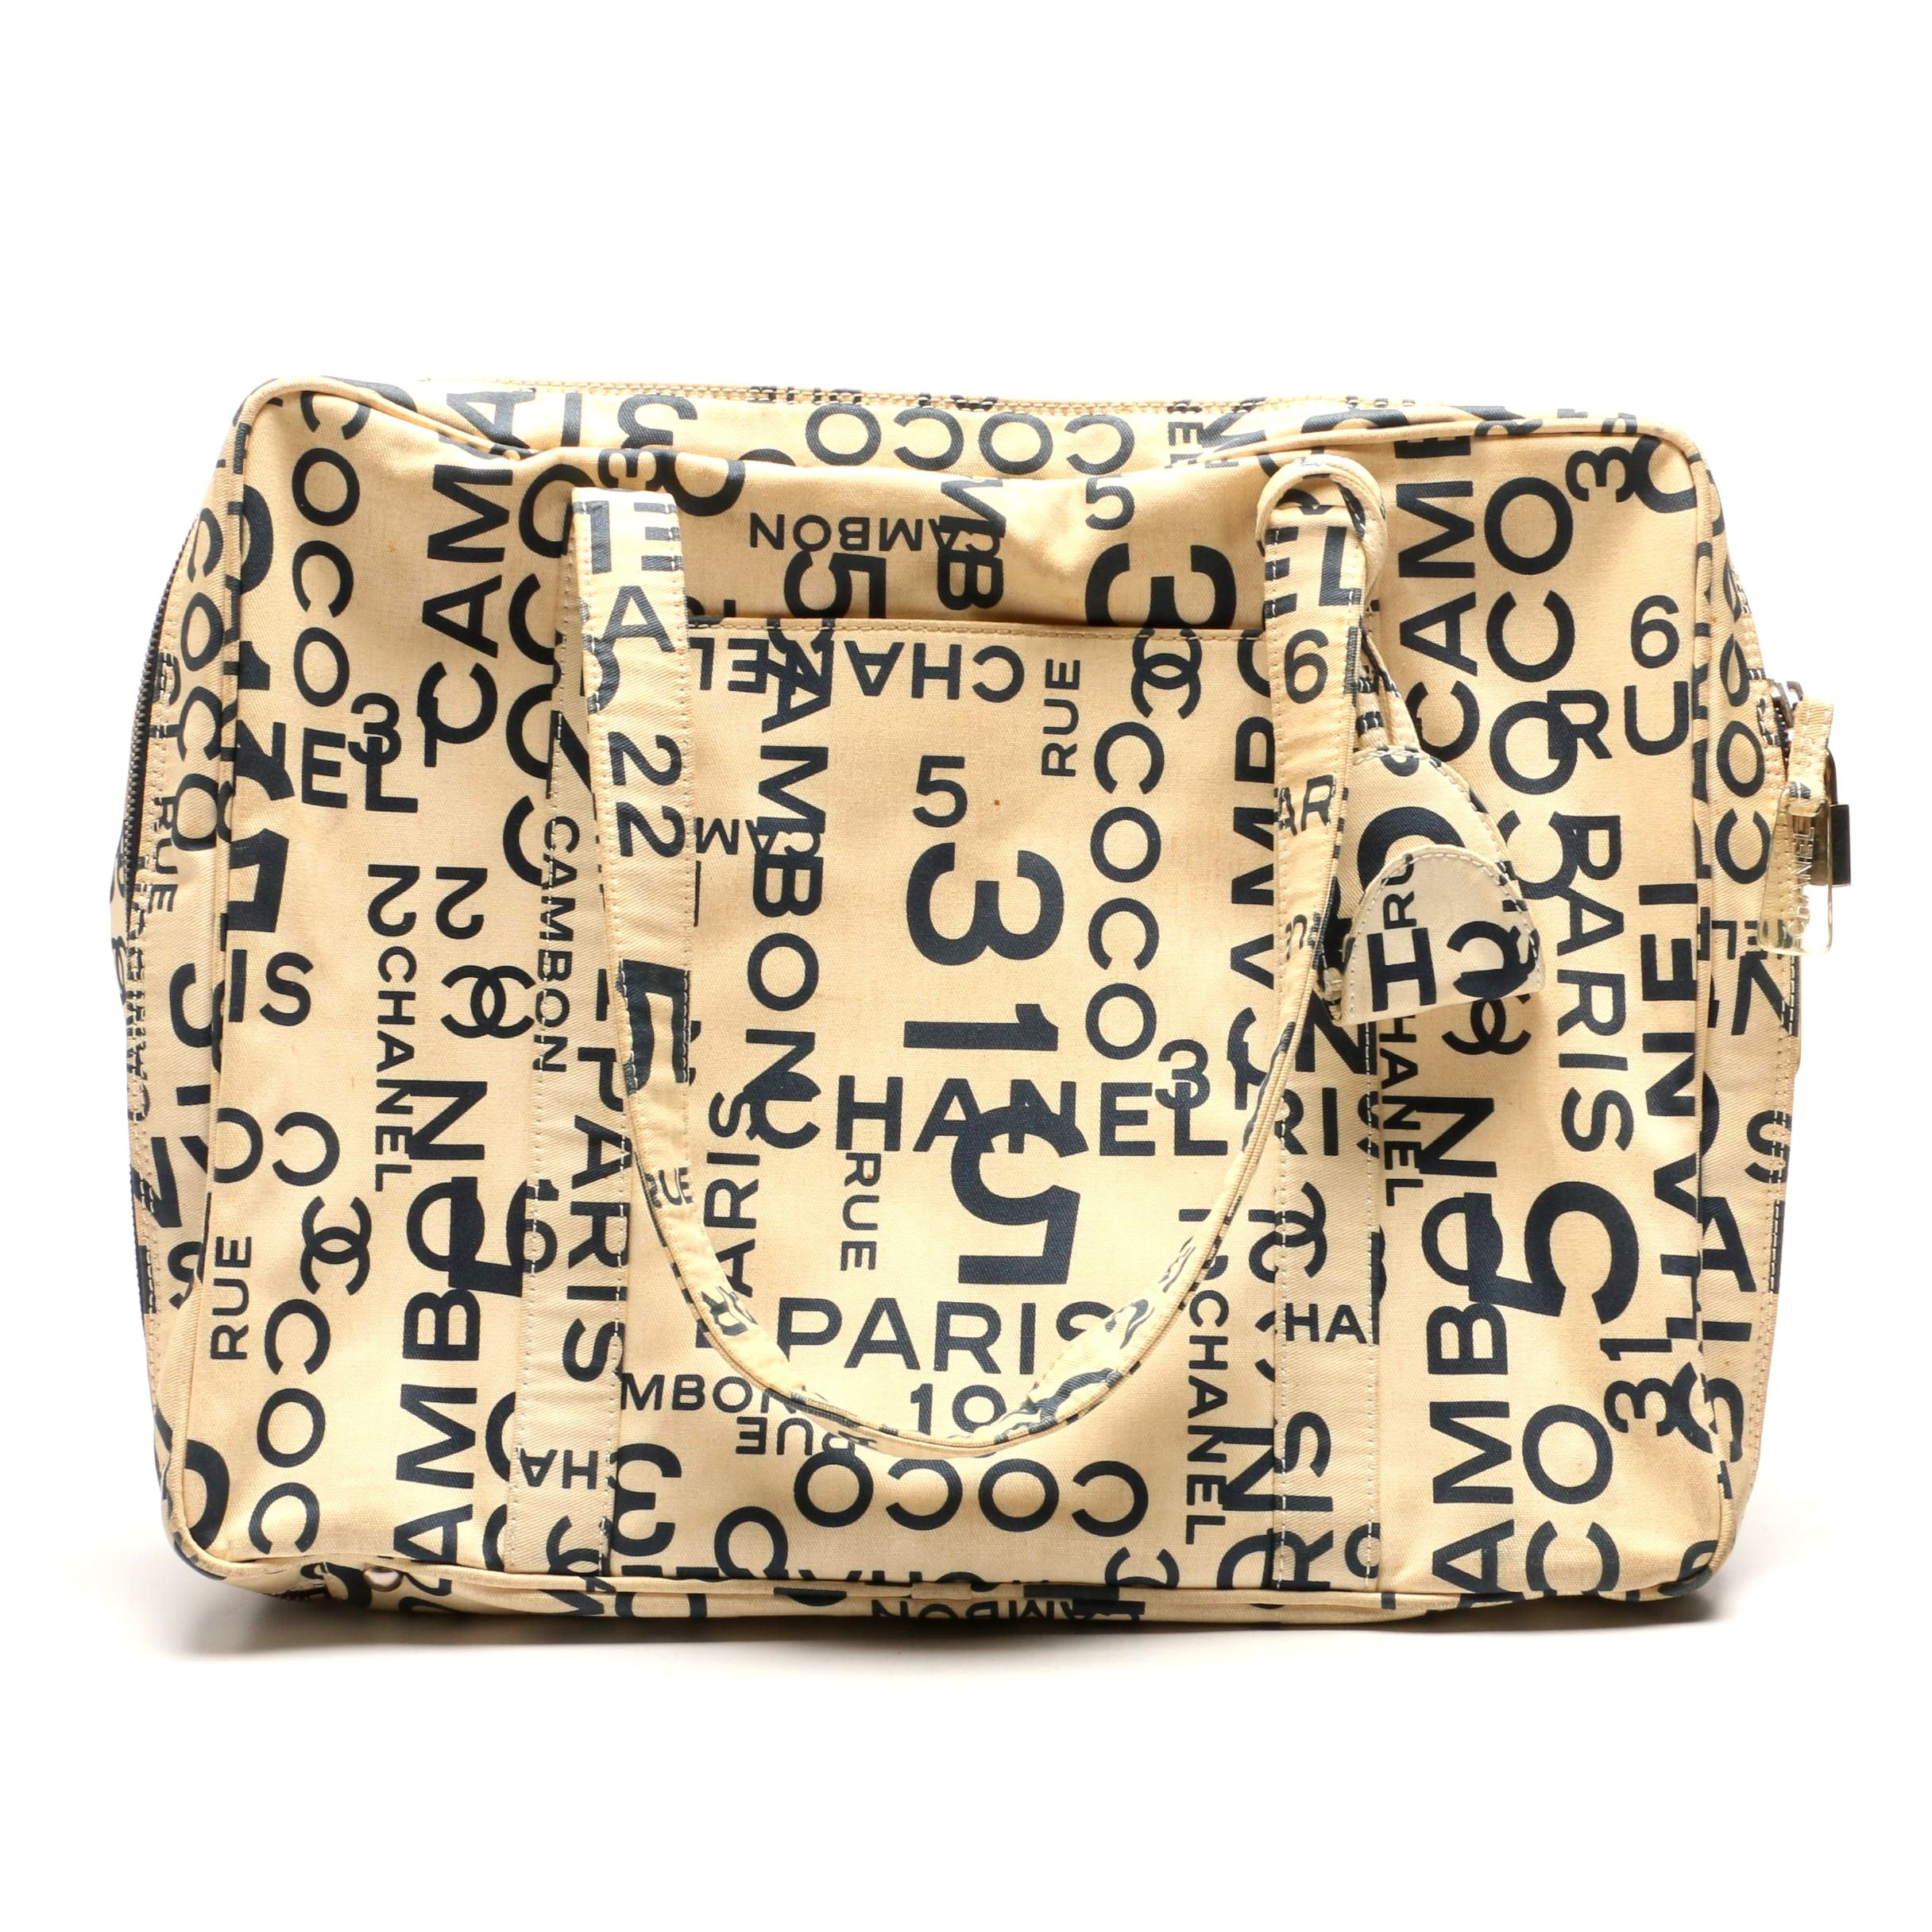 Chanel Cream and Navy Rue Cambon Logo Canvas Bag